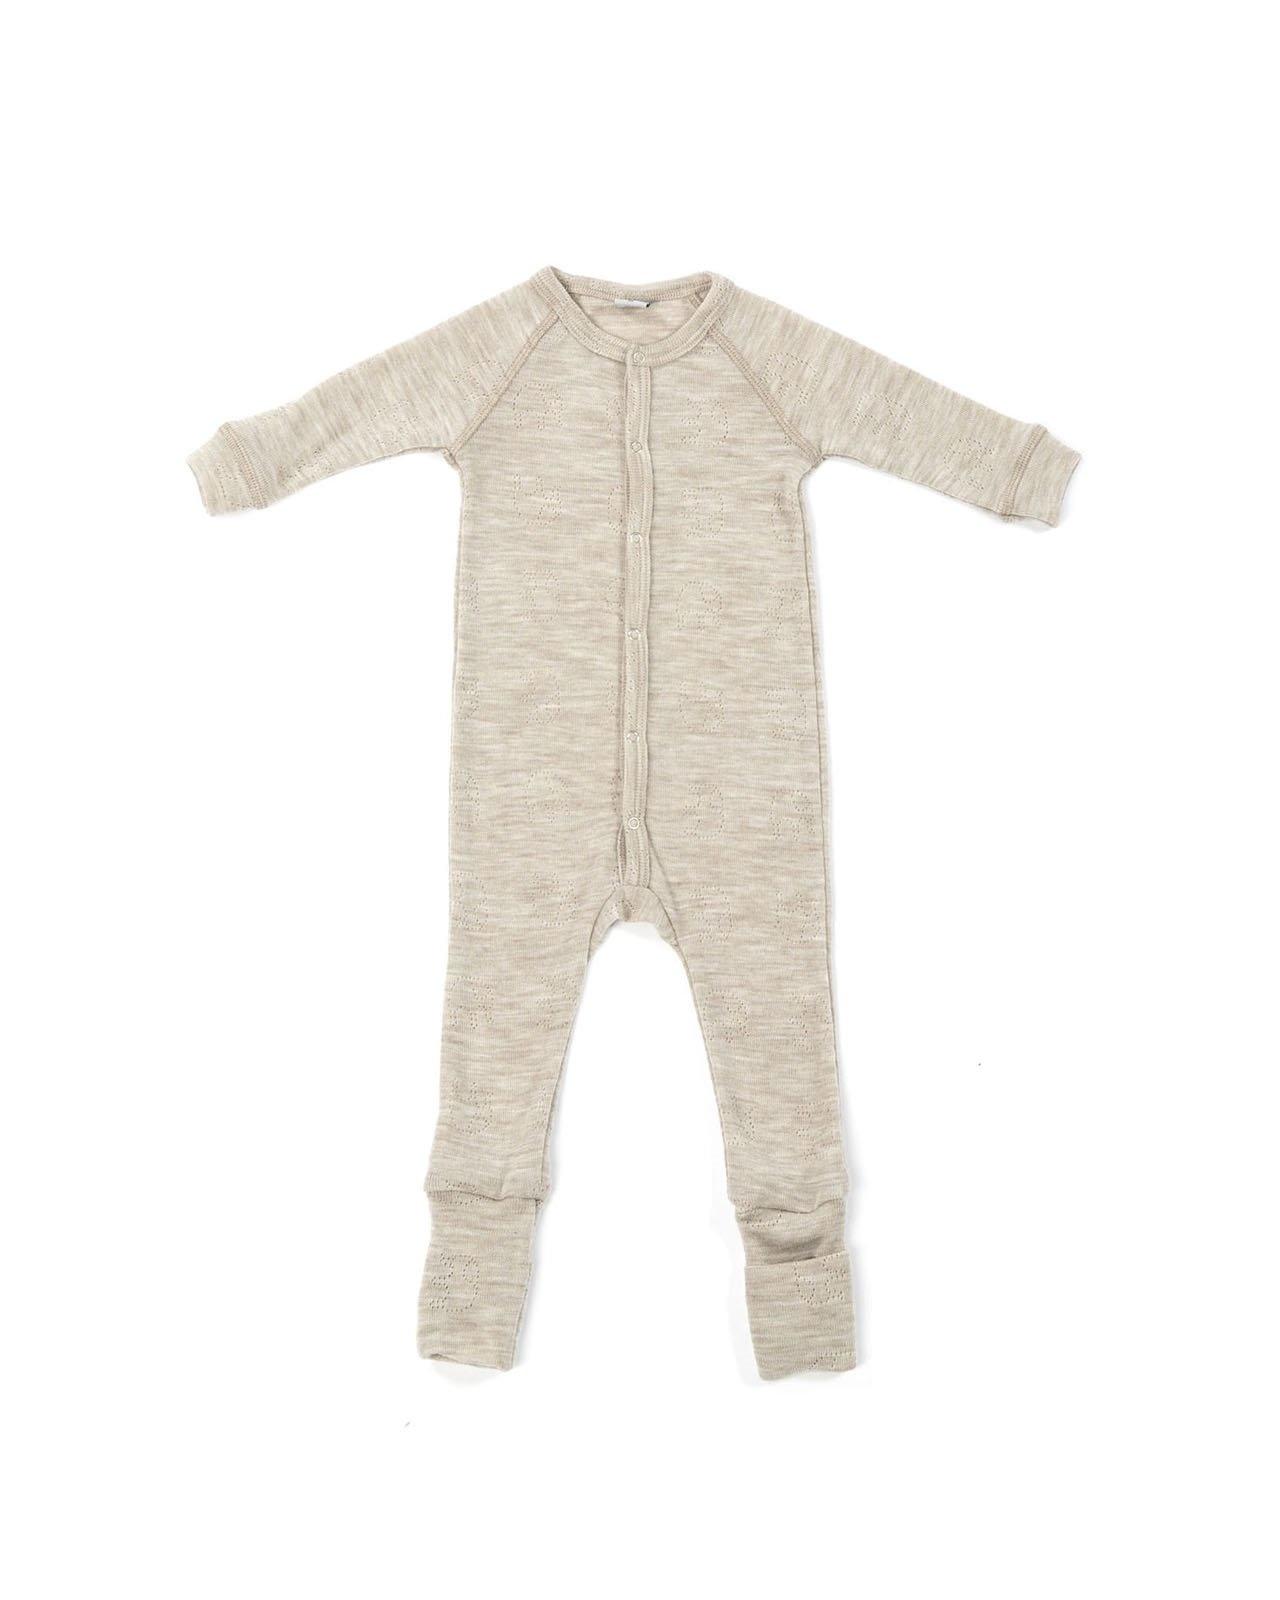 Smallstuff woolen babysuit - 100% merino - beige naturel - size 56 to 92